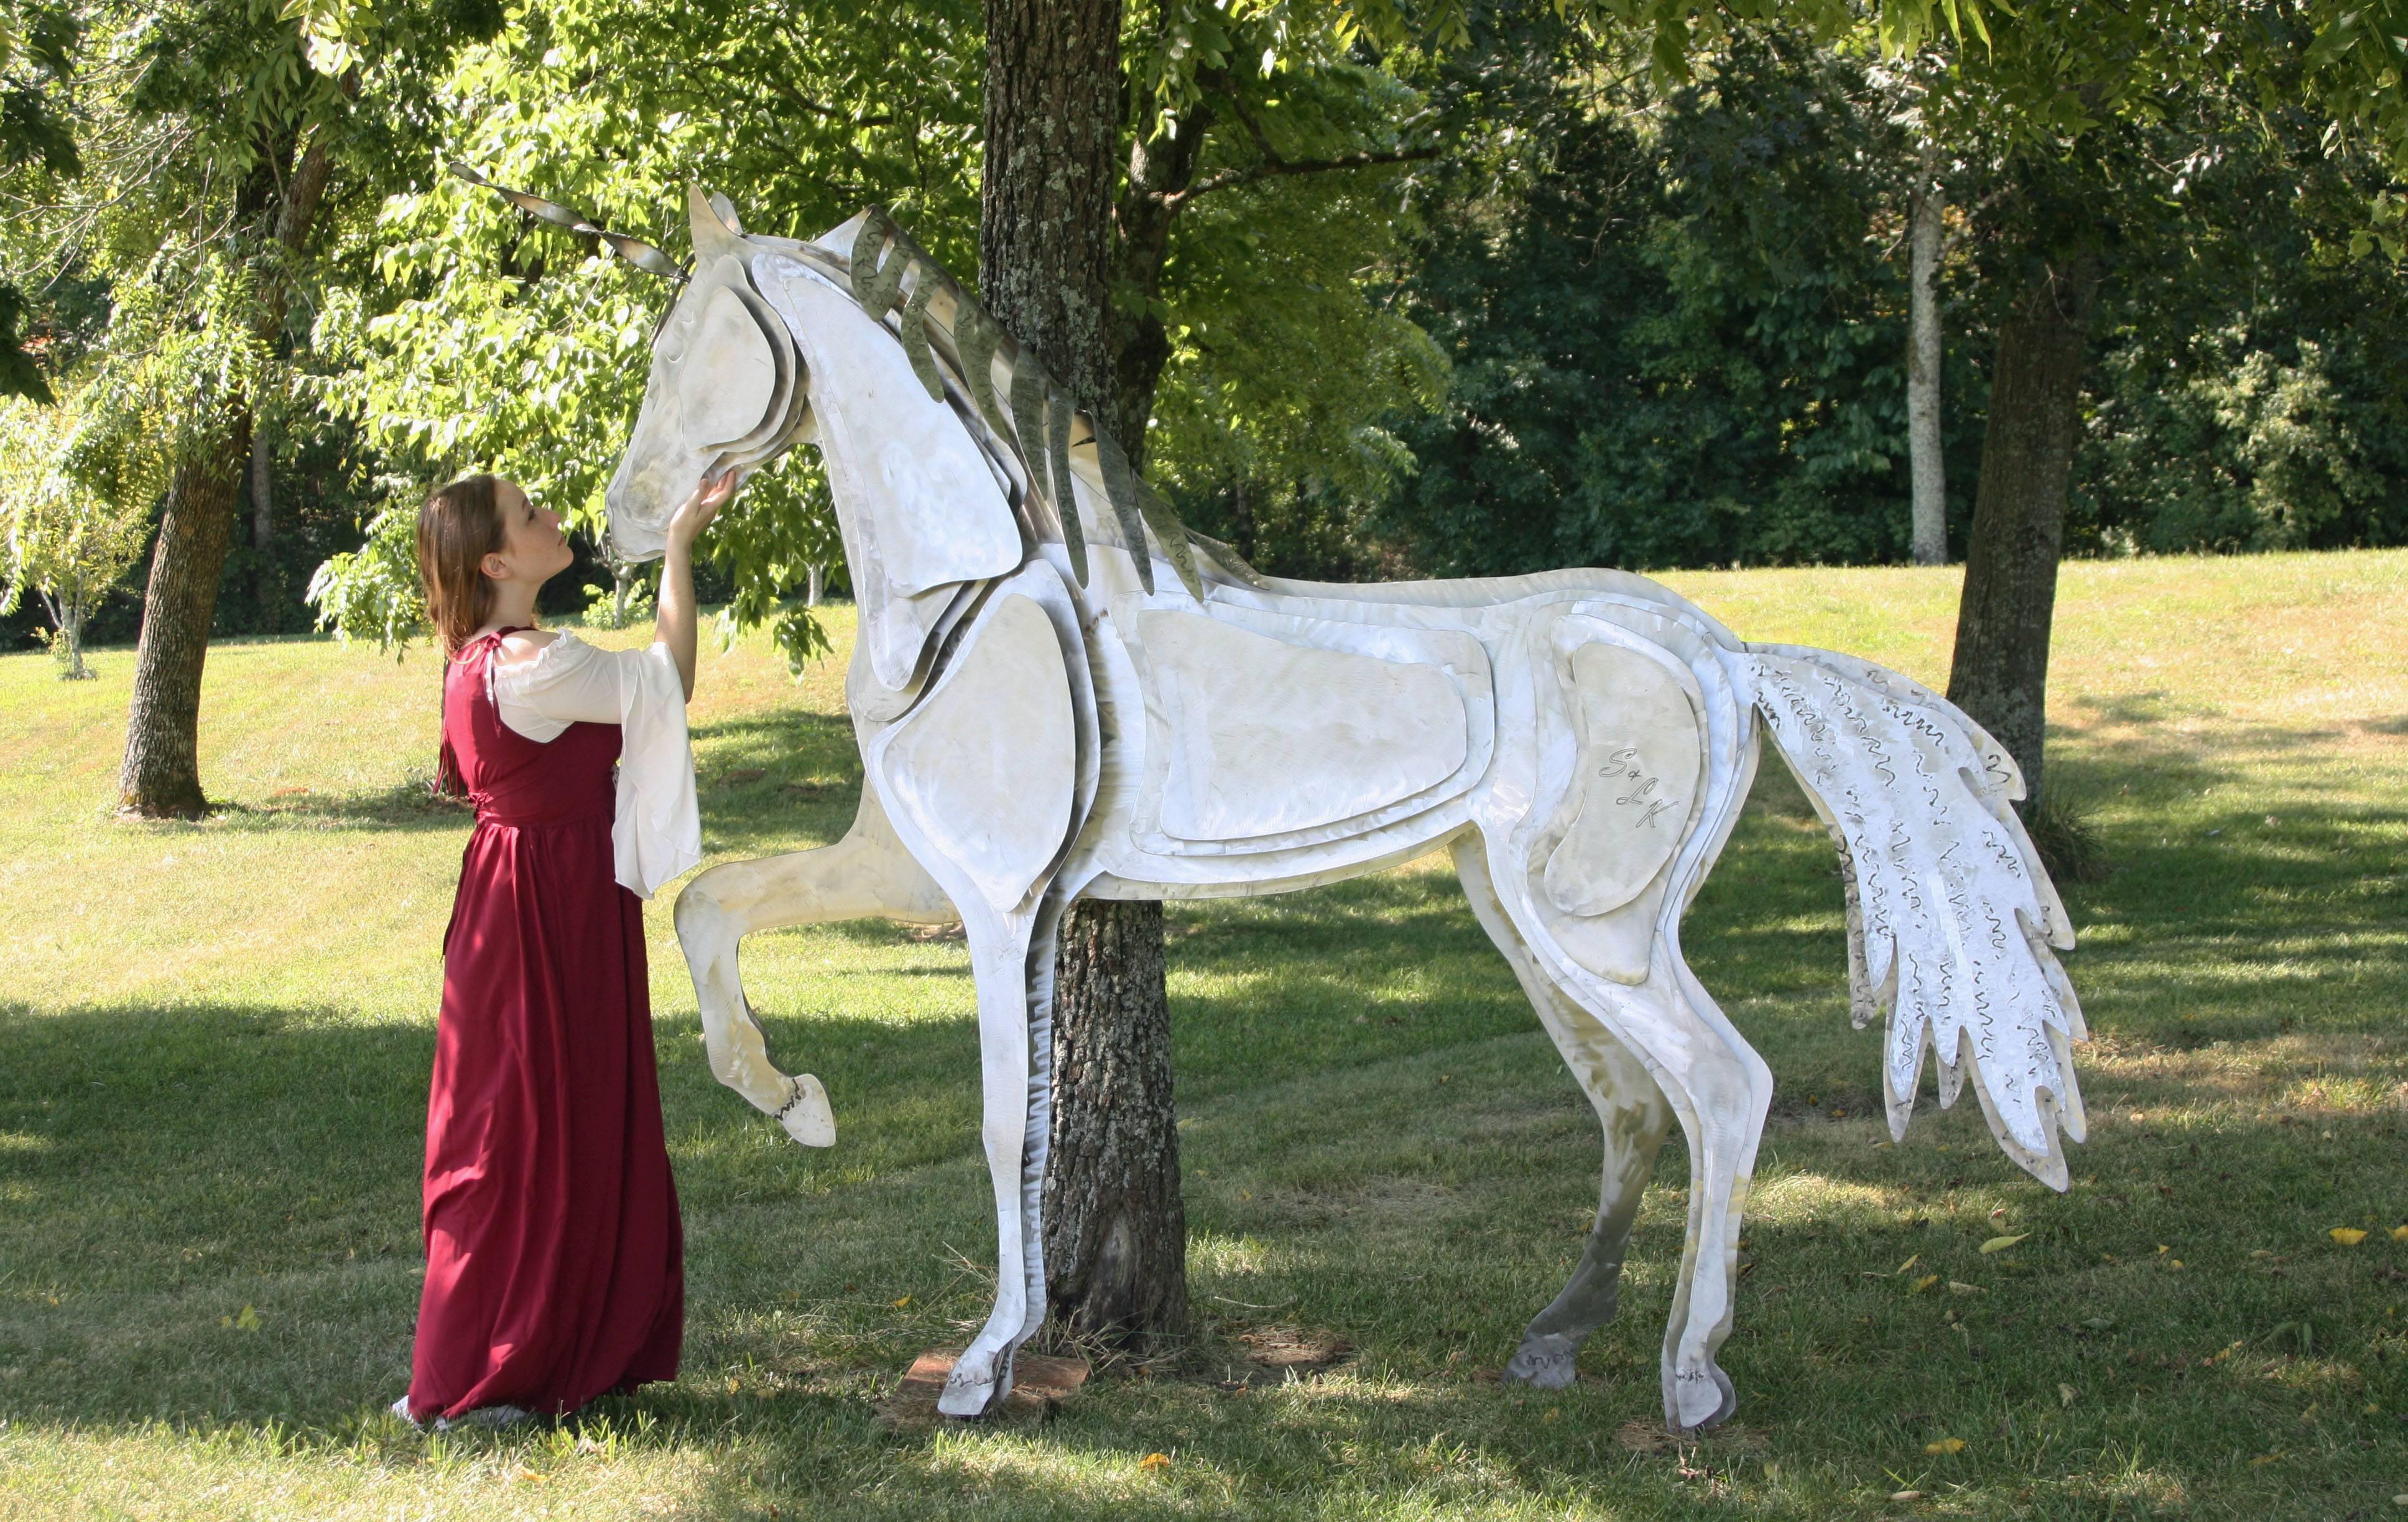 Life Size Stainless steel unicorn